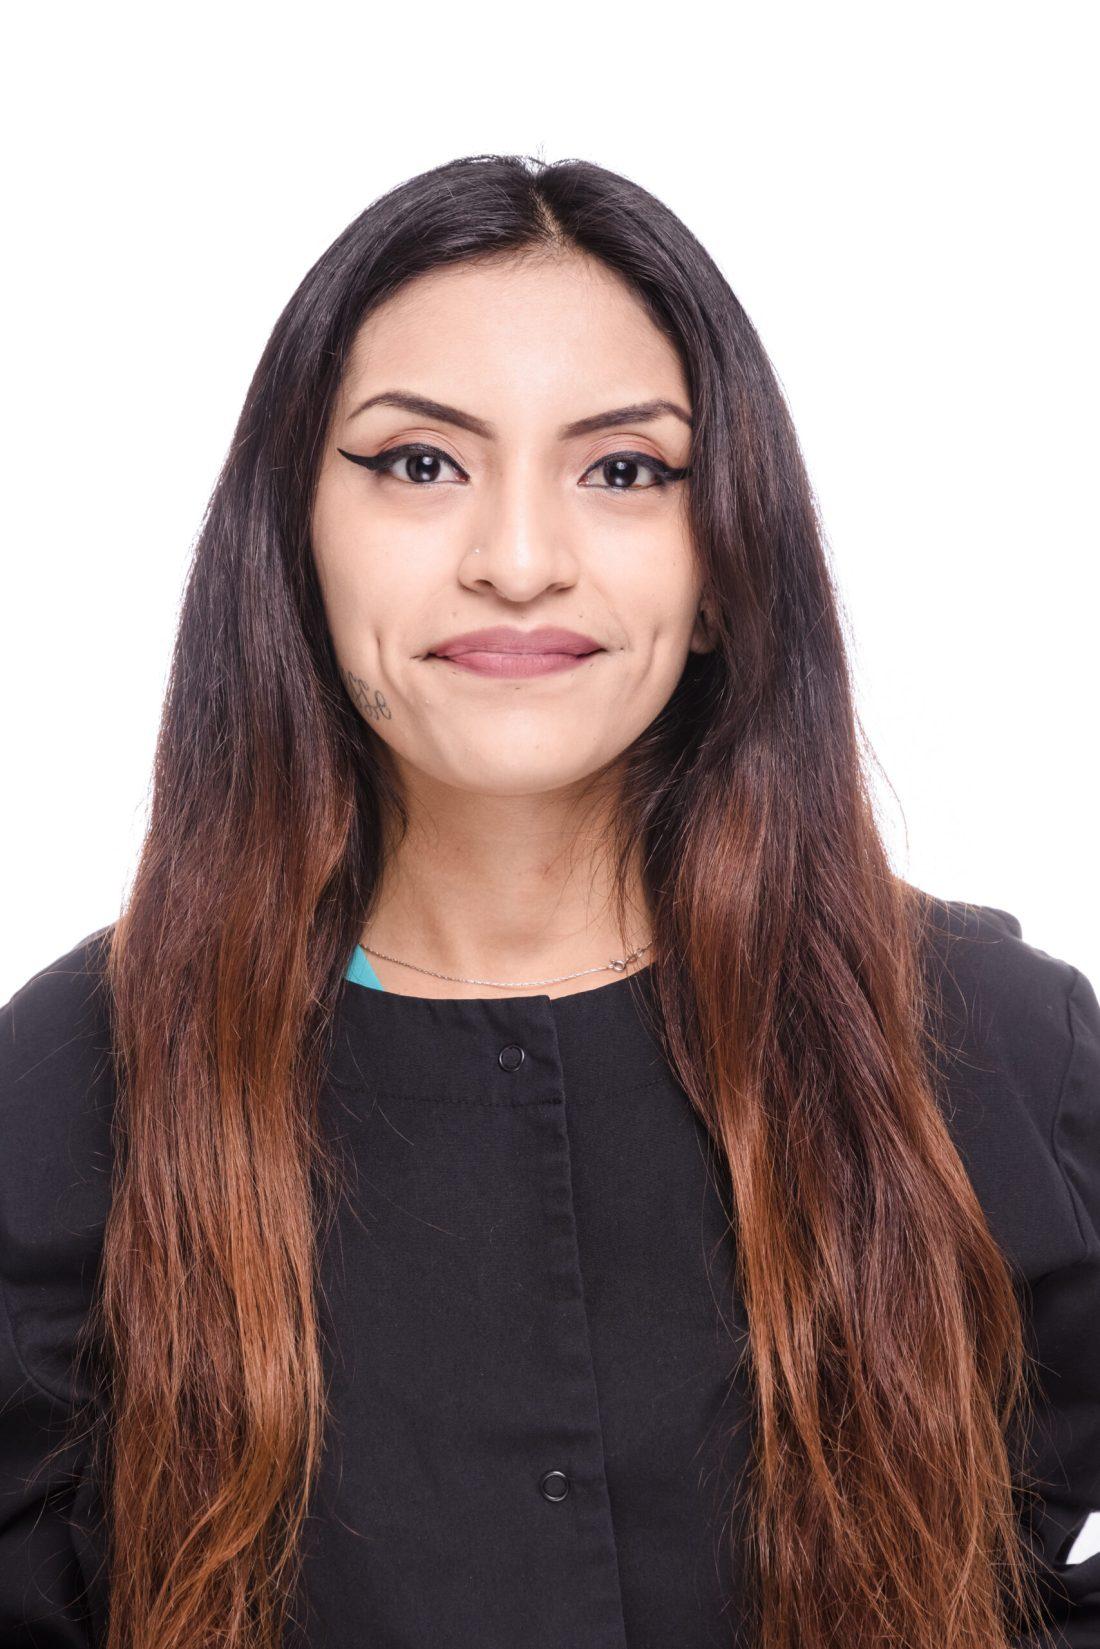 Vanessa Lezama